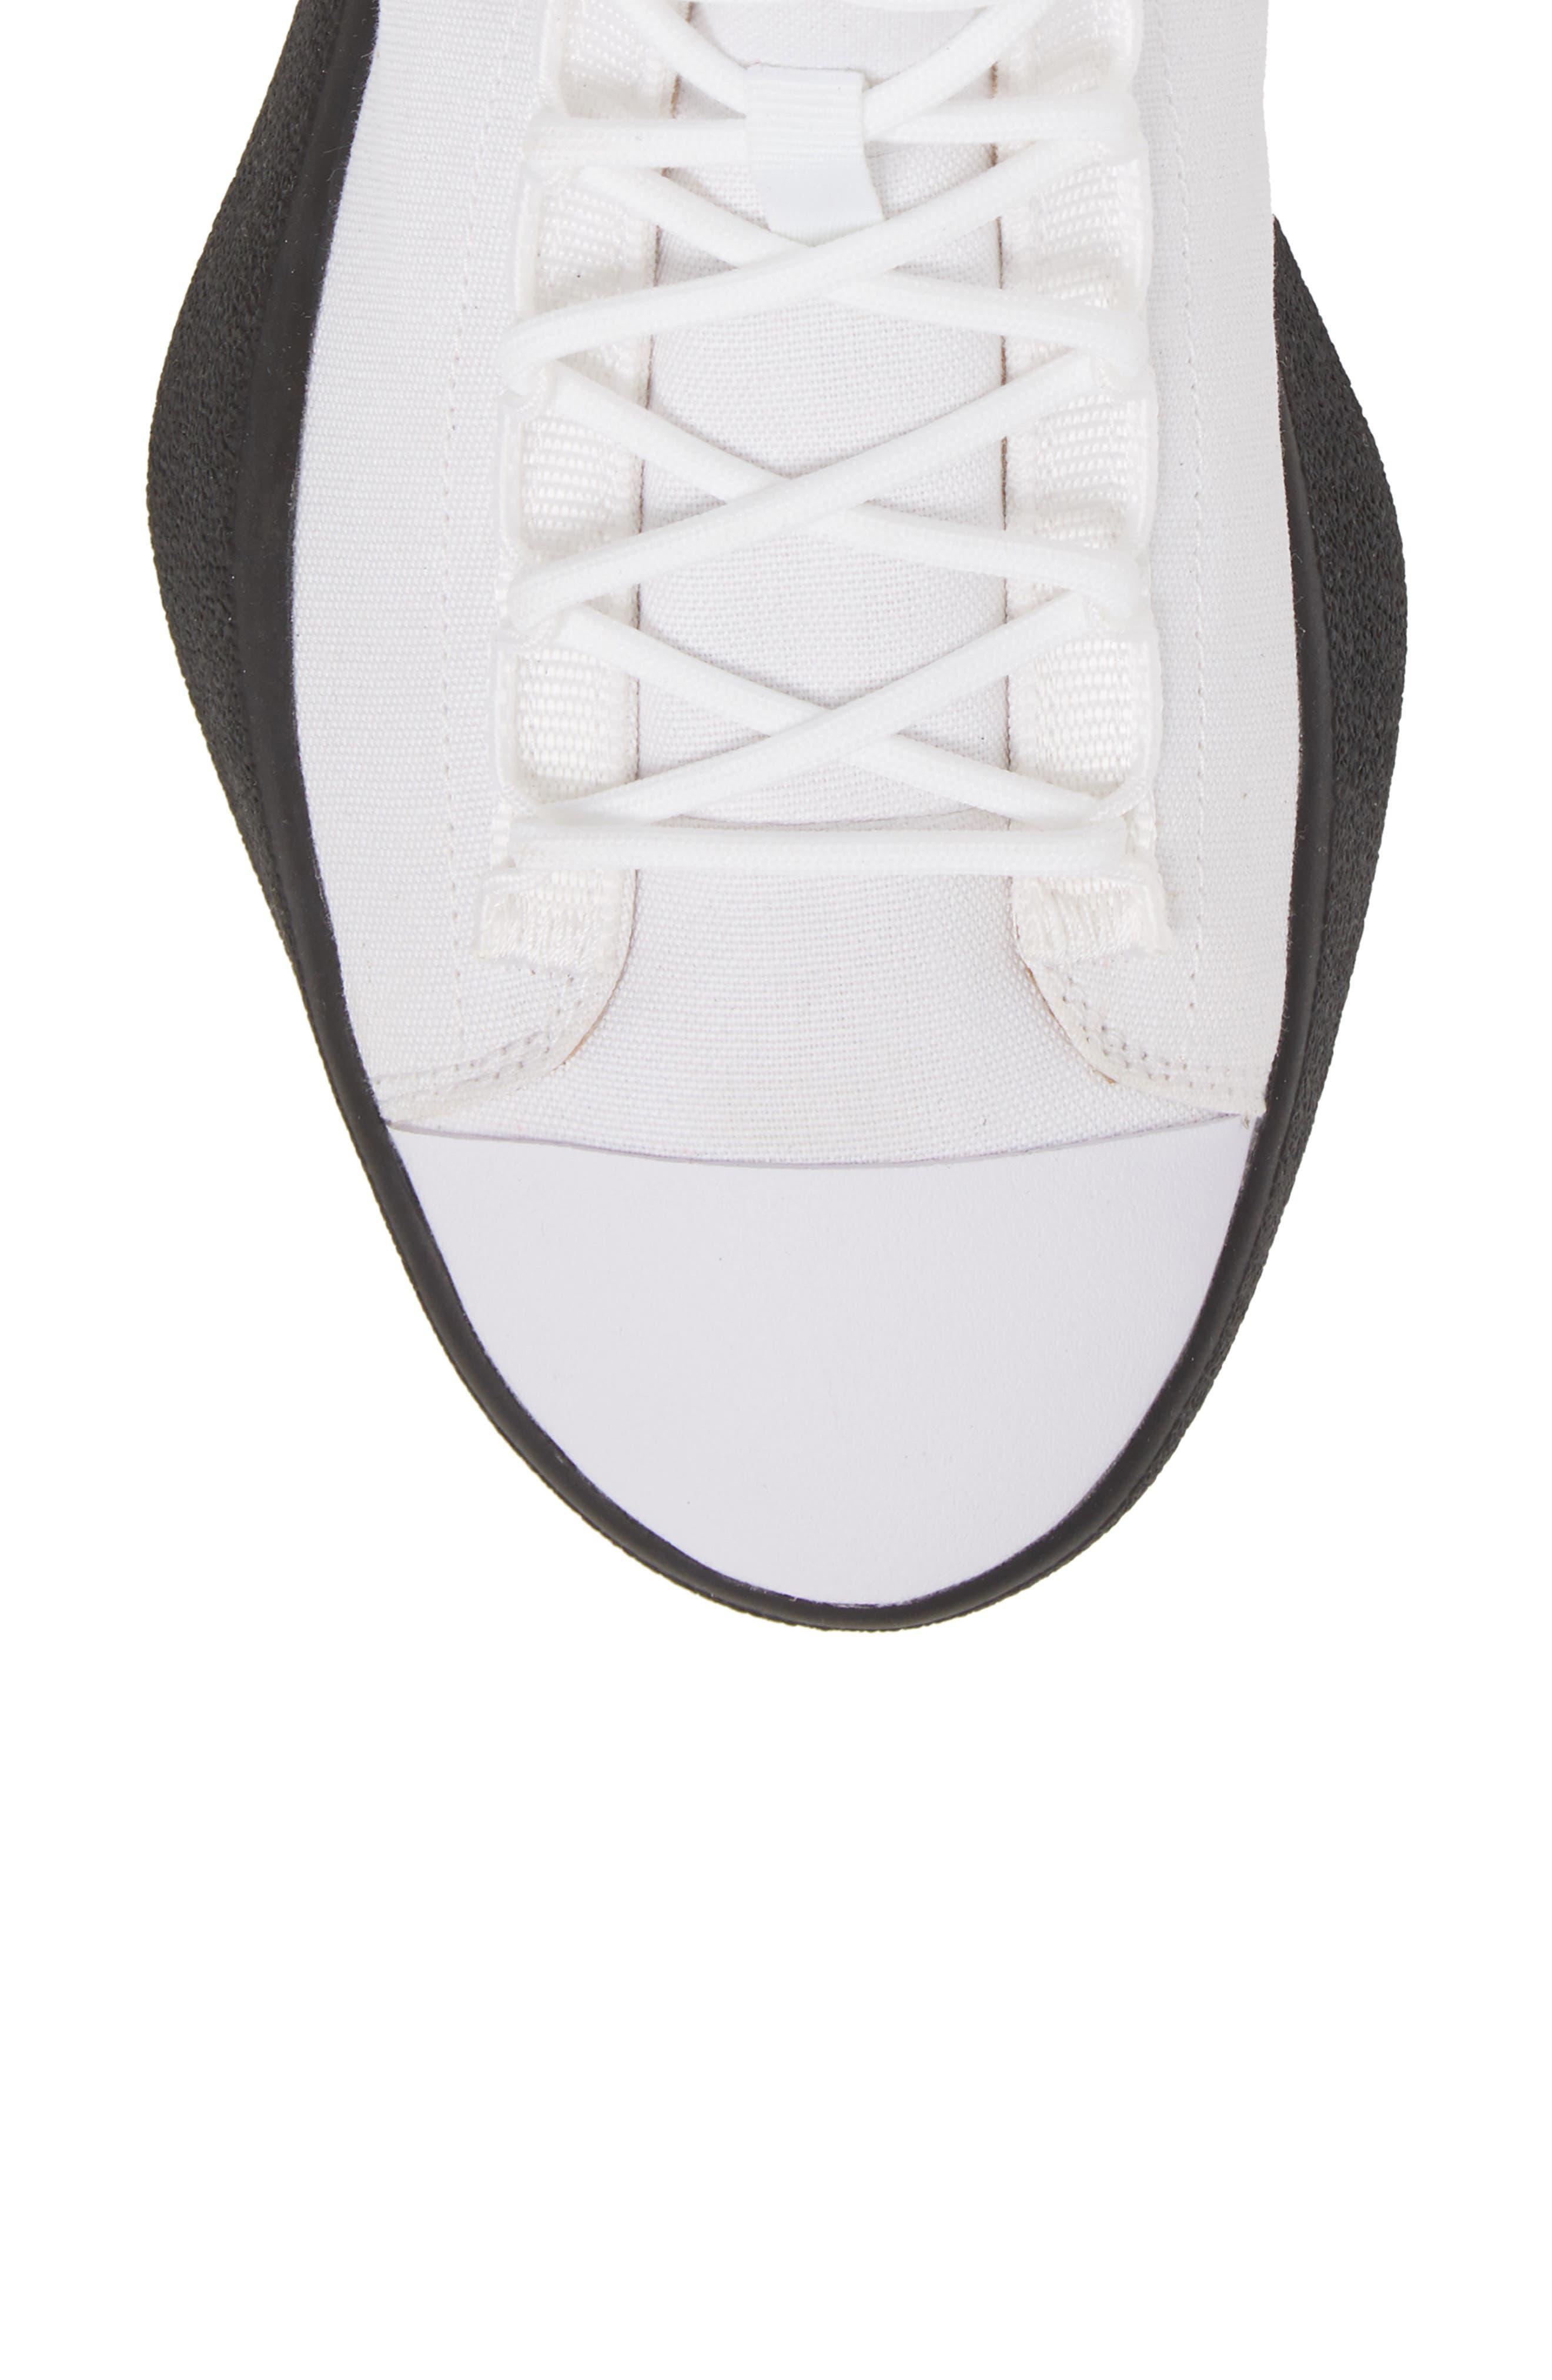 Bashyo High Top Sneaker,                             Alternate thumbnail 5, color,                             White/ Black